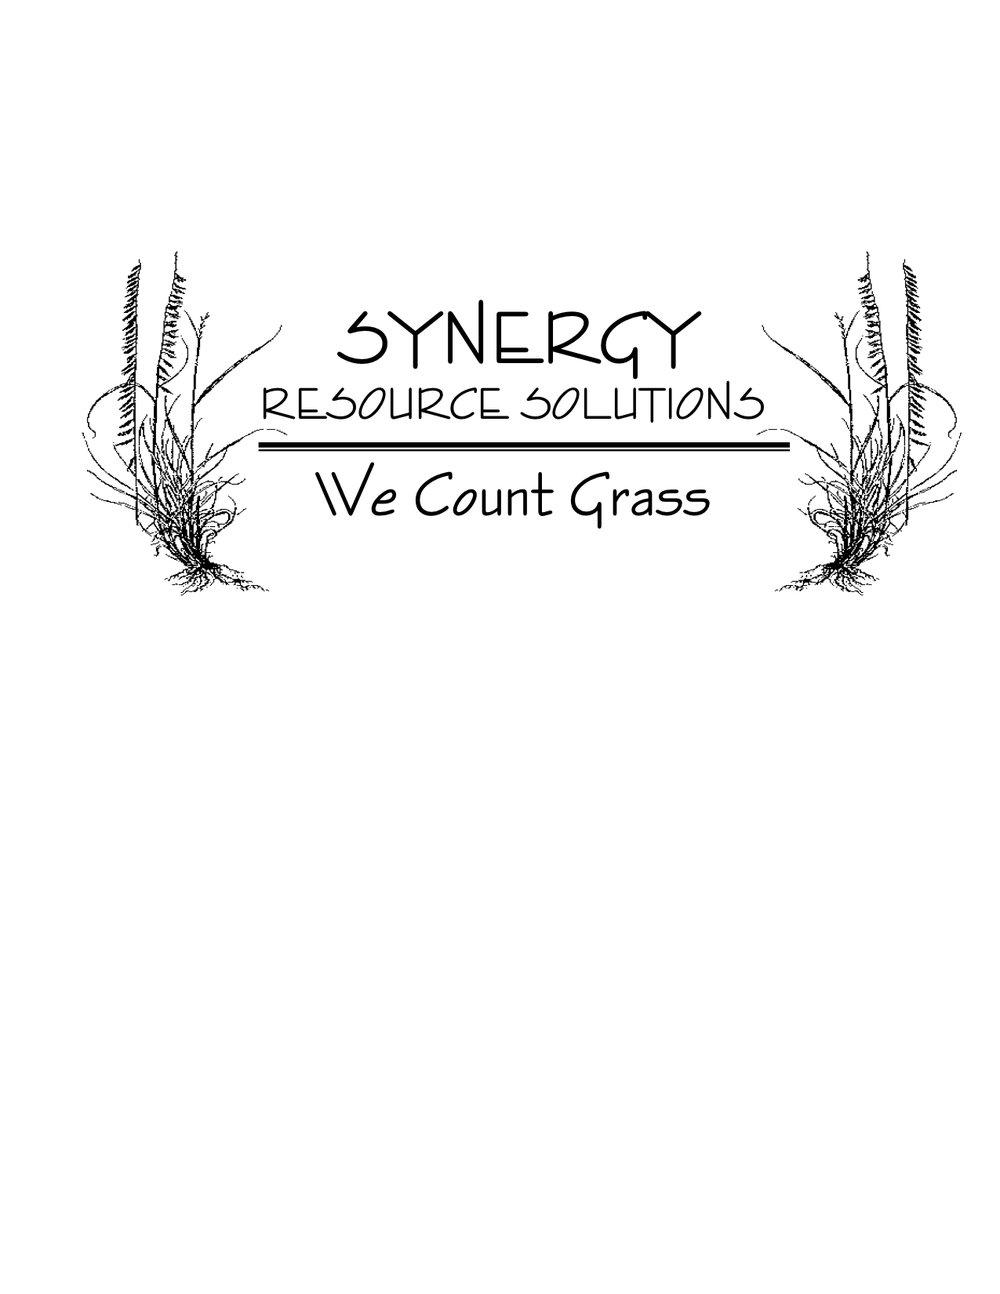 synergy logo no oval.jpg